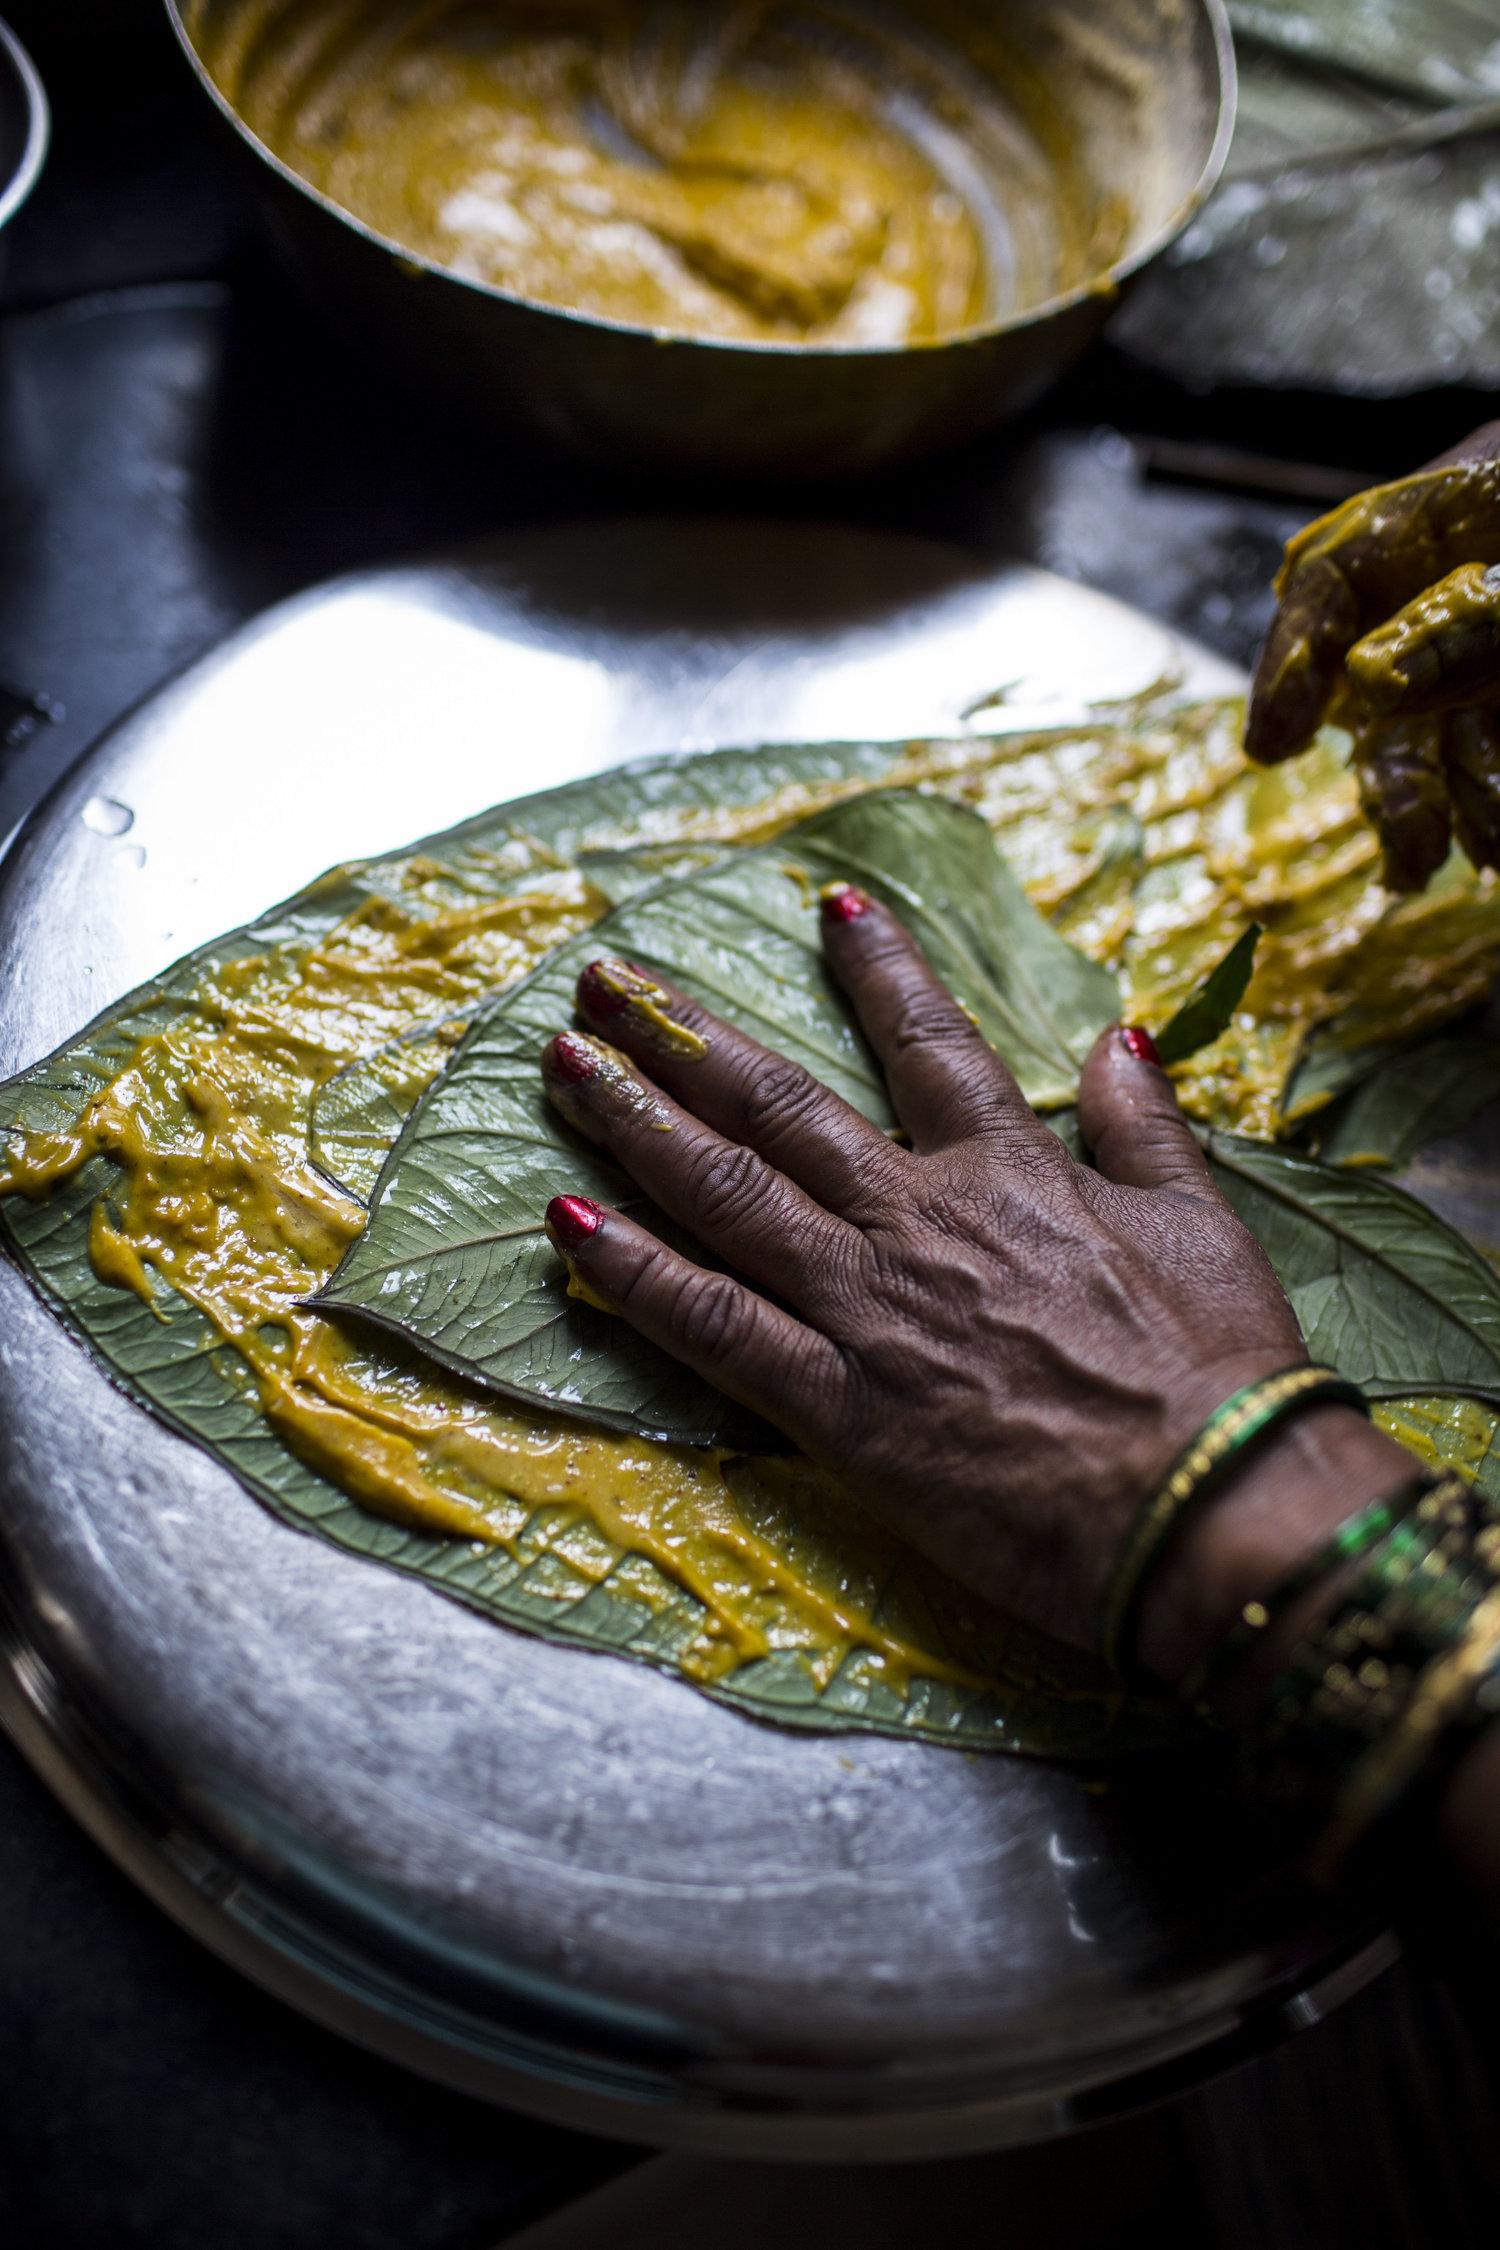 Recipe+for+Patrel+_+Gujarati+farsan+made+with+colocassia+leaves.jpeg